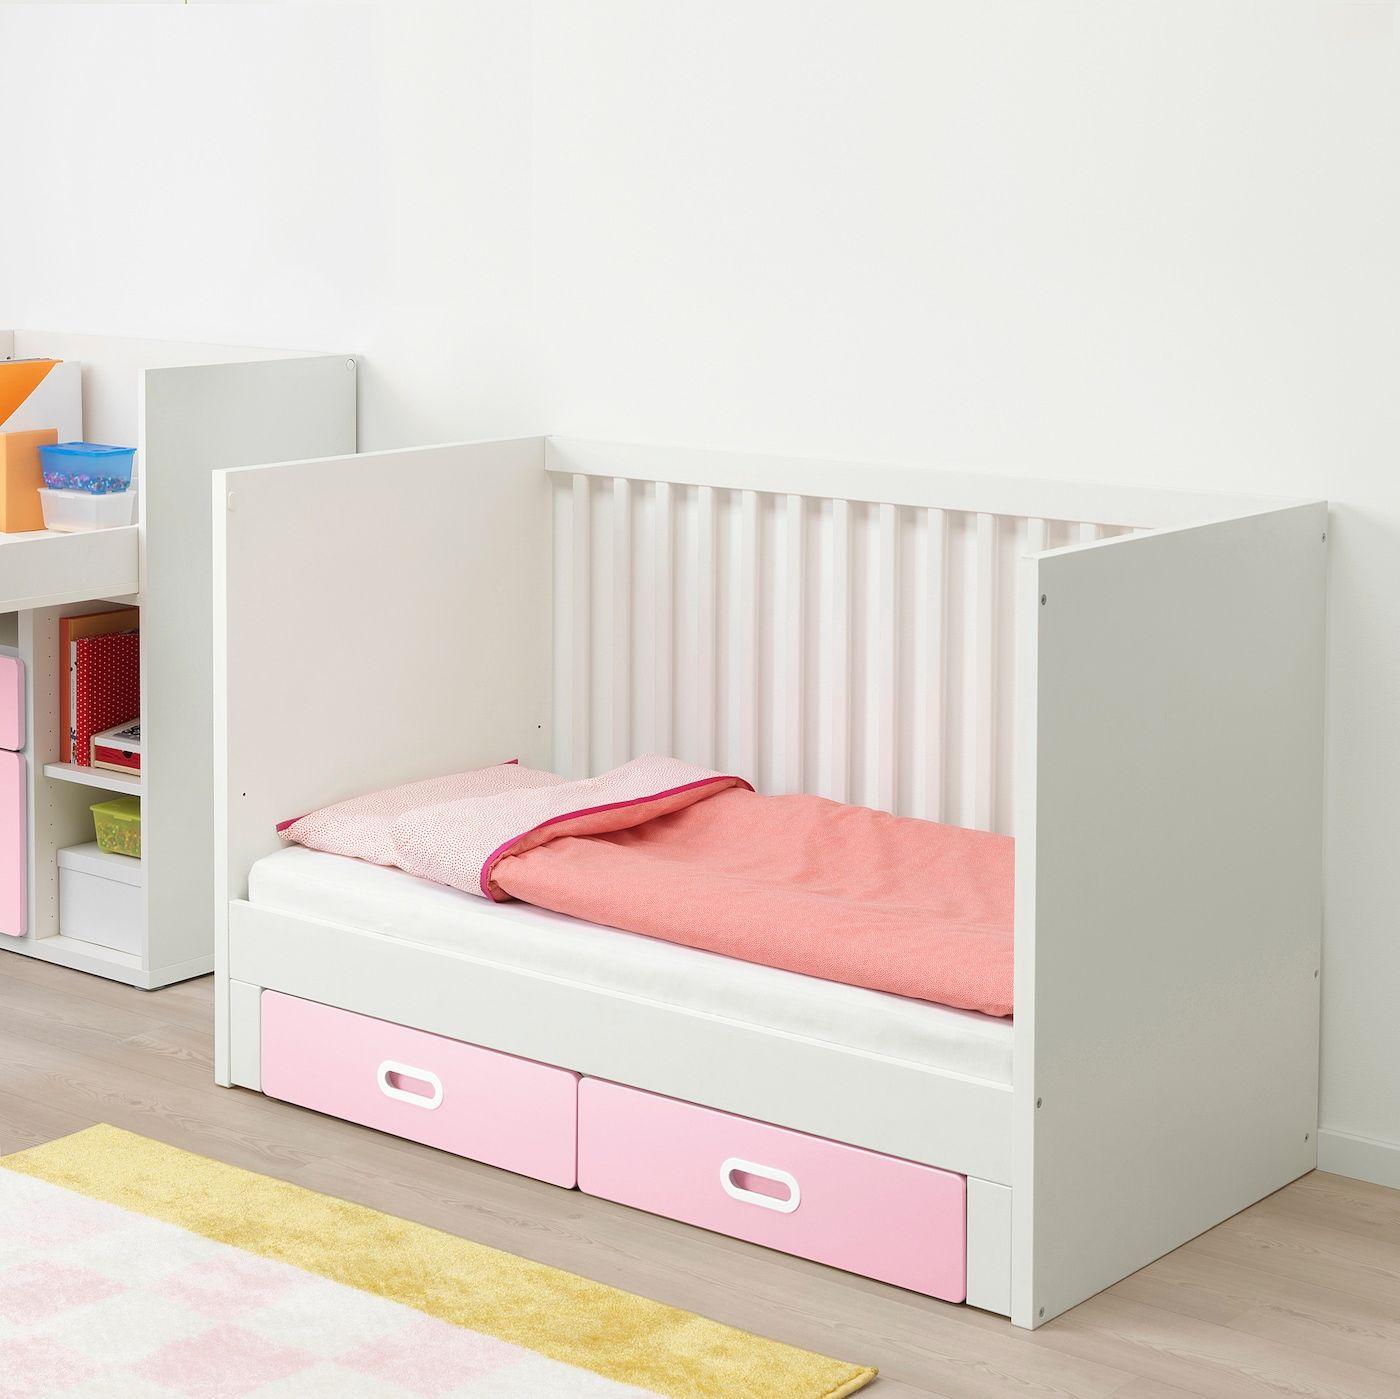 Ikea Stuva Fritids Crib With Drawers Light Pink In 2020 Ikea